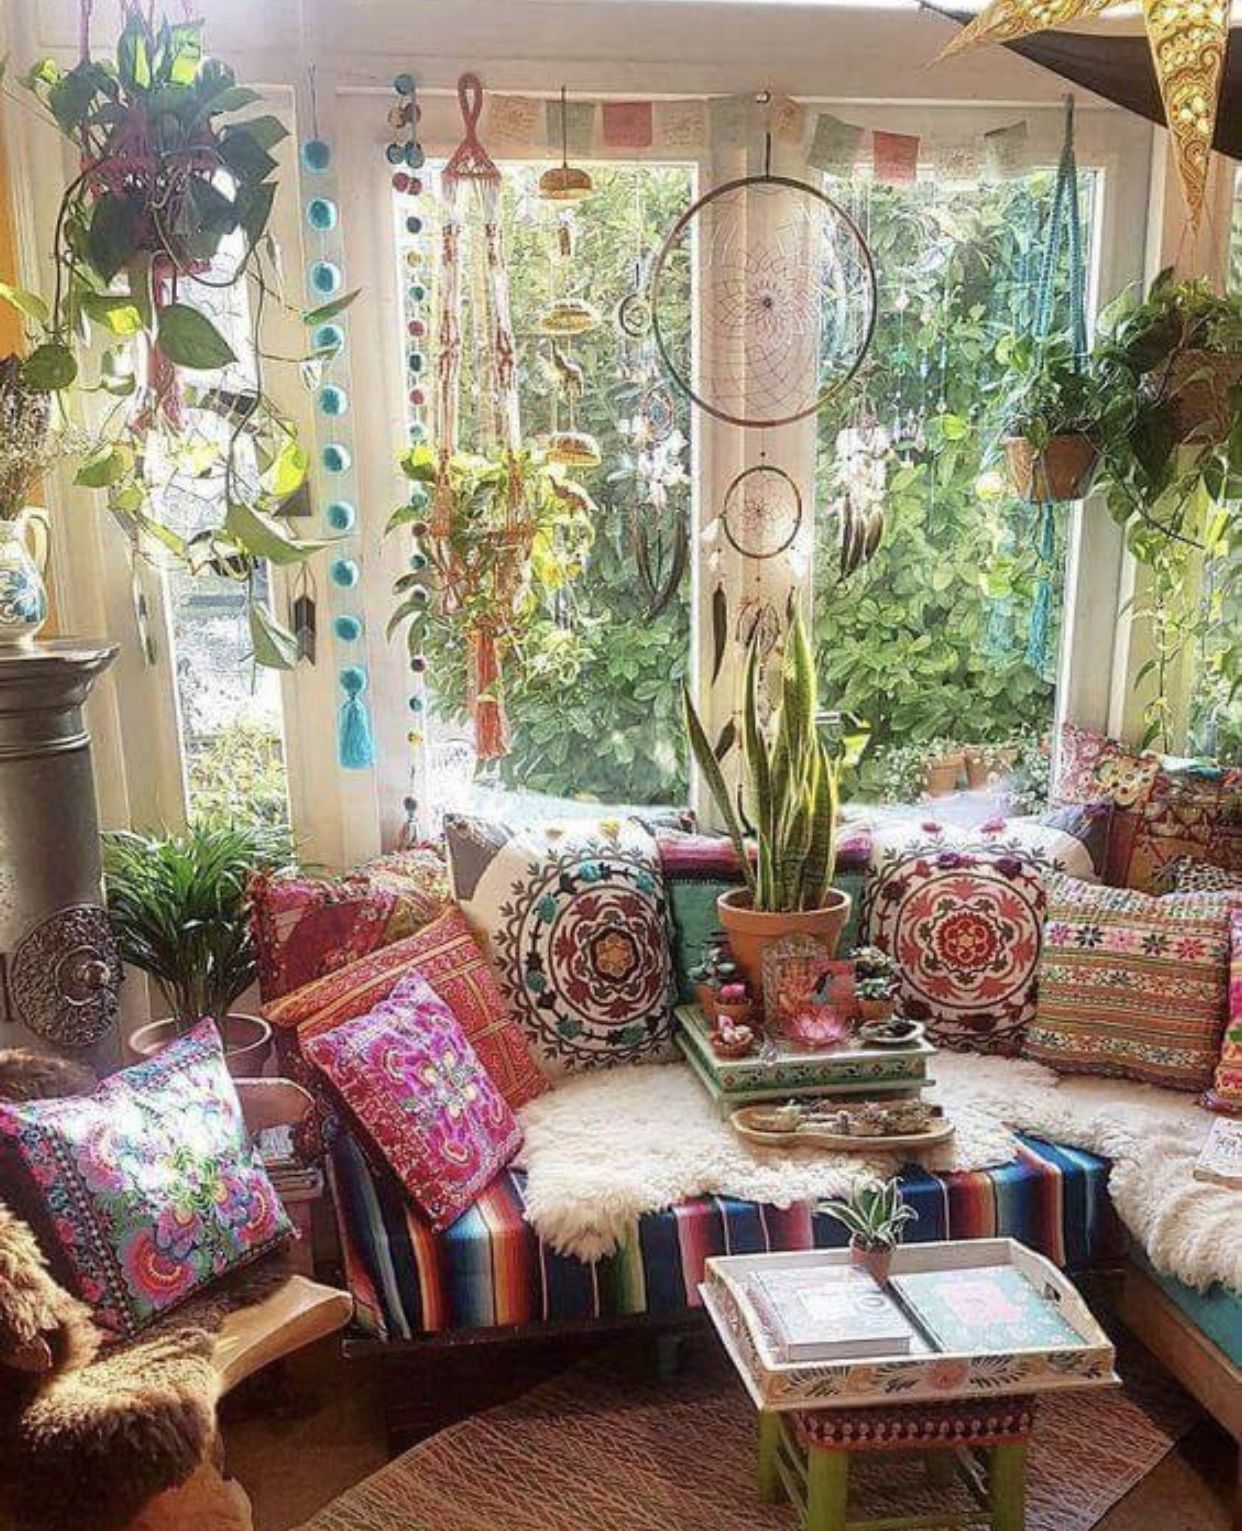 Hippie lounge | Bohemian living room decor on Bohemian Living Room Decor Ideas  id=53303